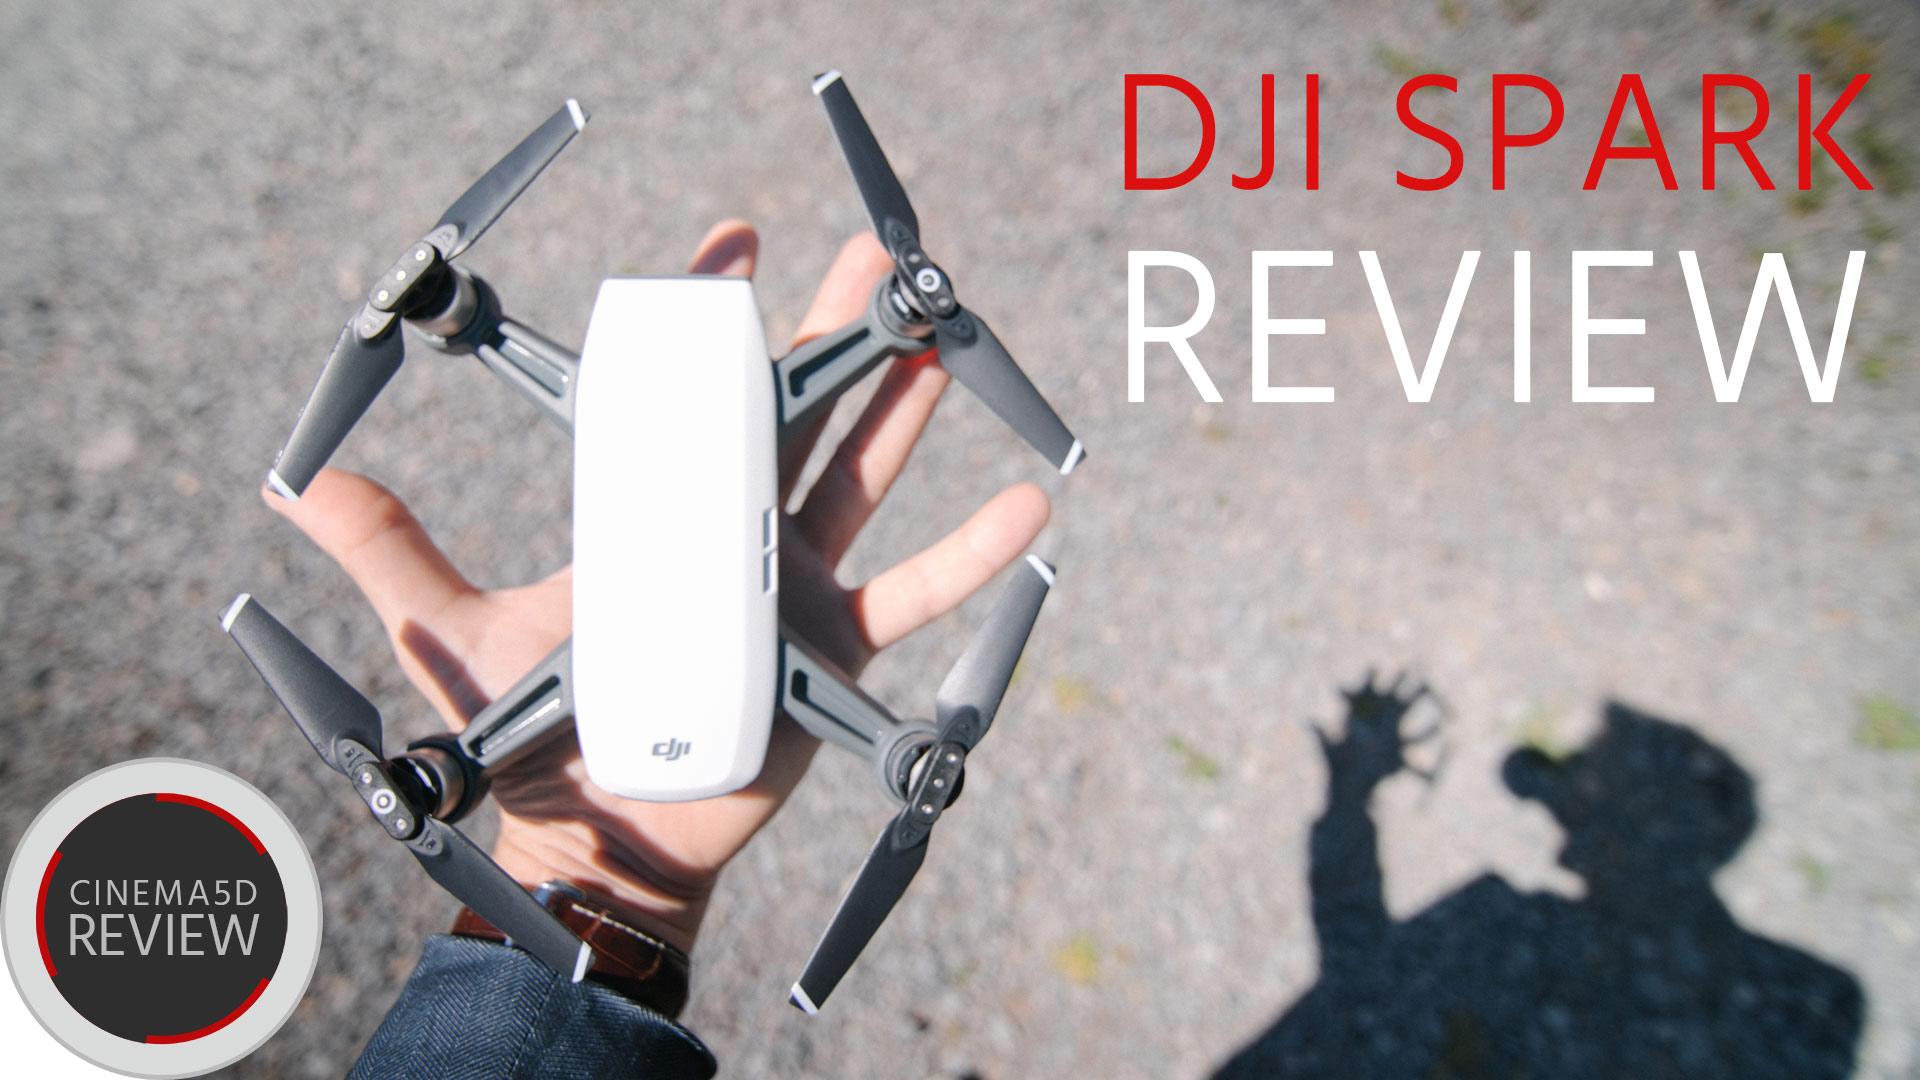 DJI Sparkレビュー - この小型ドローンはプロ用途に使えるか?